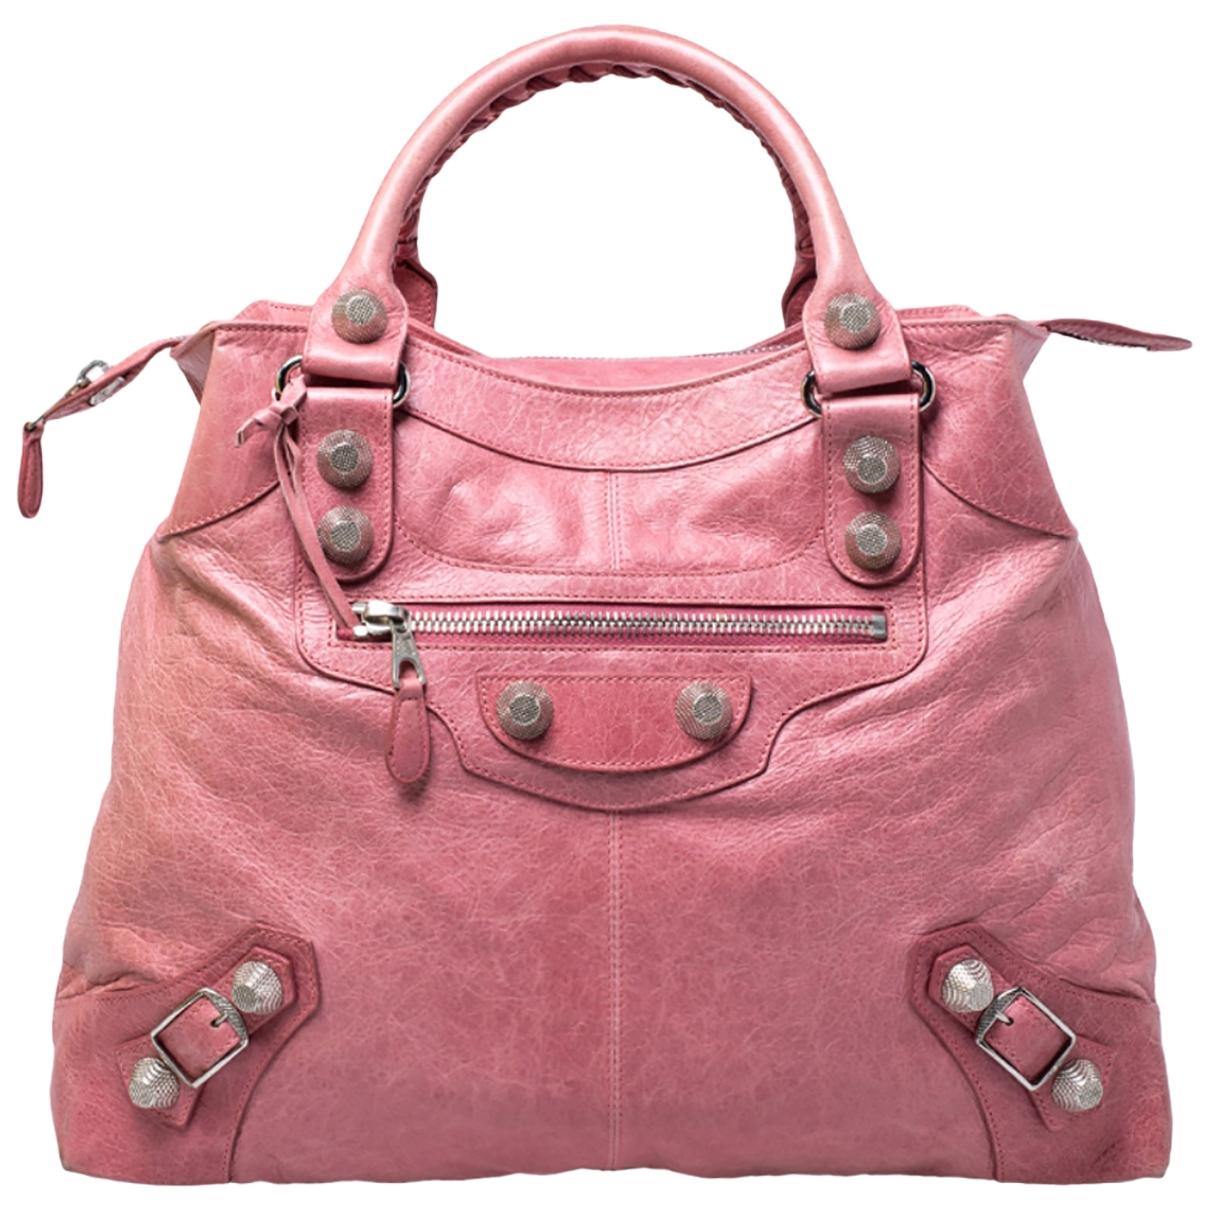 Balenciaga \N Pink Leather handbag for Women \N